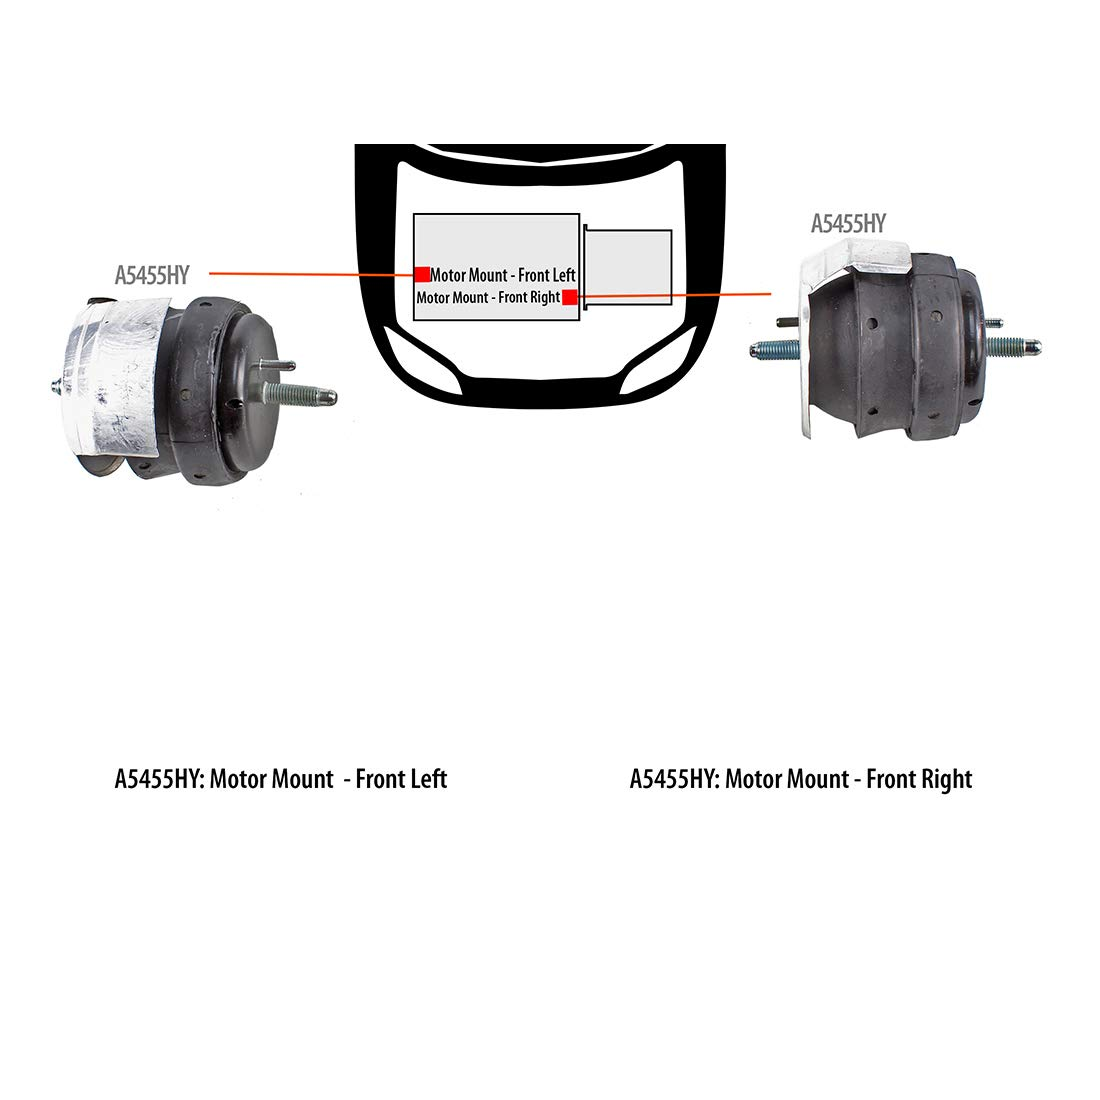 DNJ MMK1083 Complete Enigne Motor Mount Front L /& R kit for 2003-2010 Cadillac//SRX,STS,CTS //3.2L 6.0L